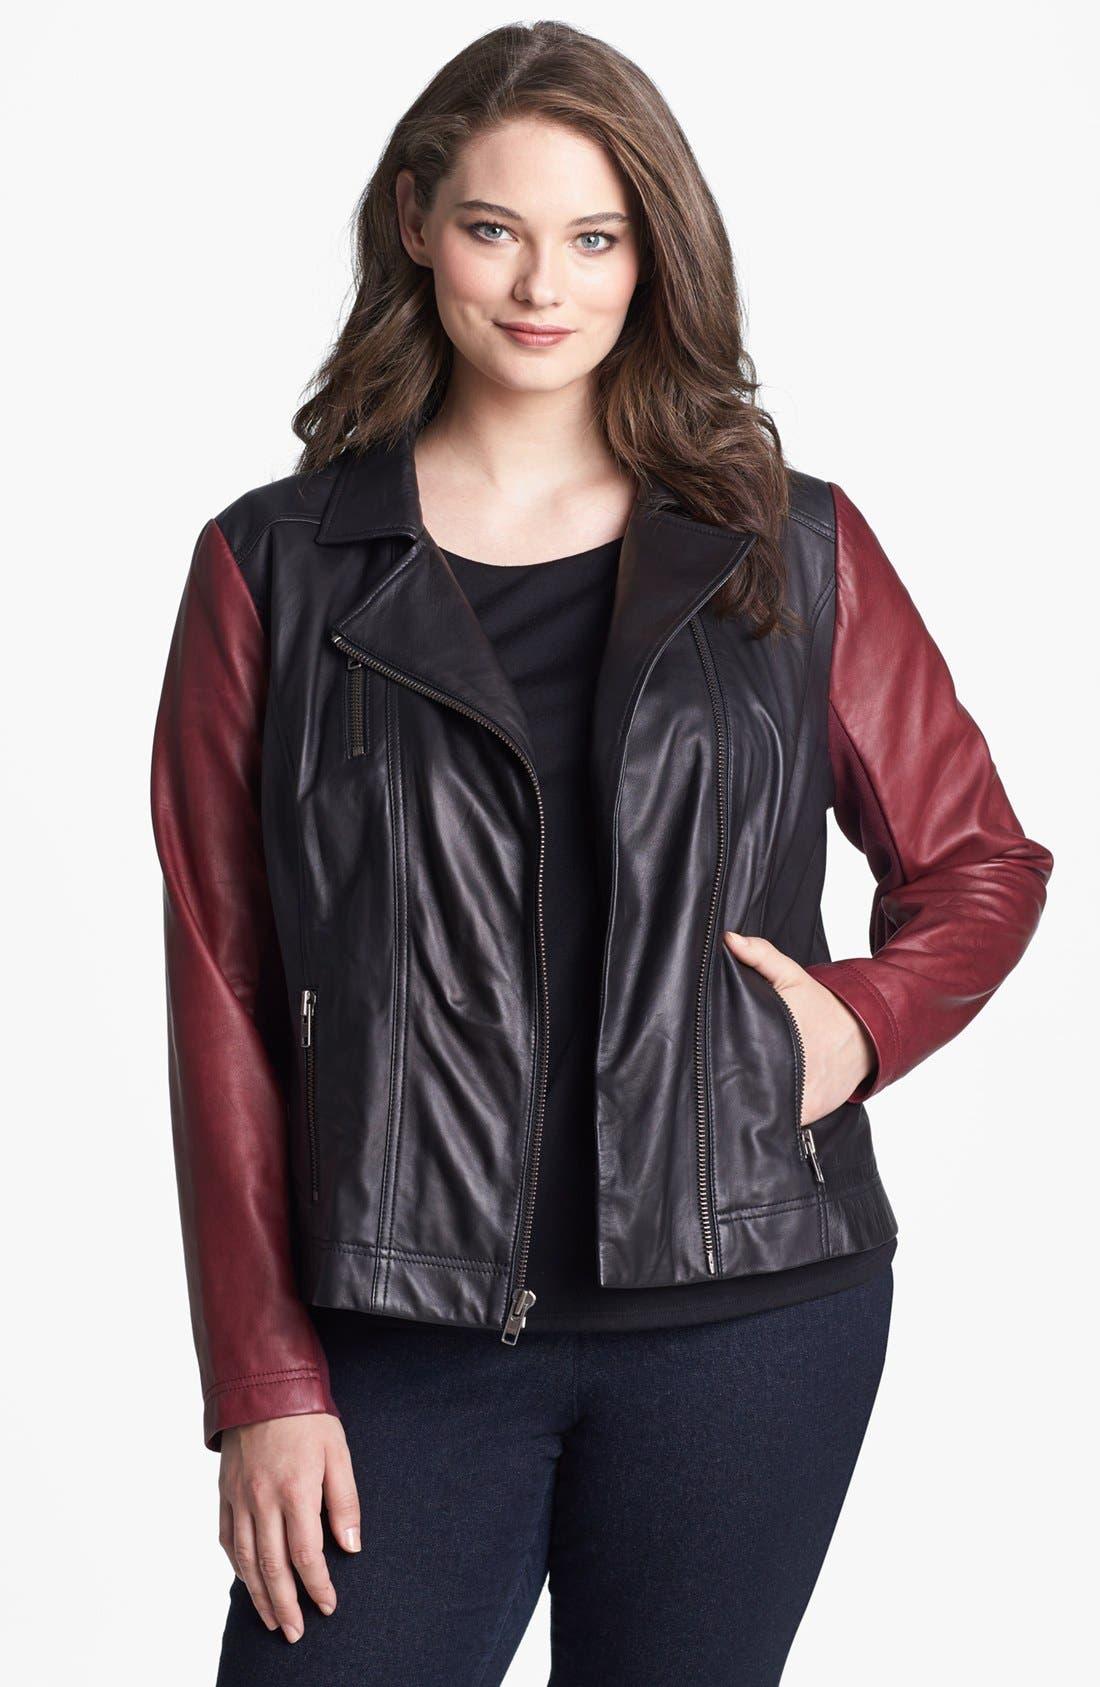 Alternate Image 1 Selected - Halogen® Colorblock Leather Moto Jacket (Plus Size)